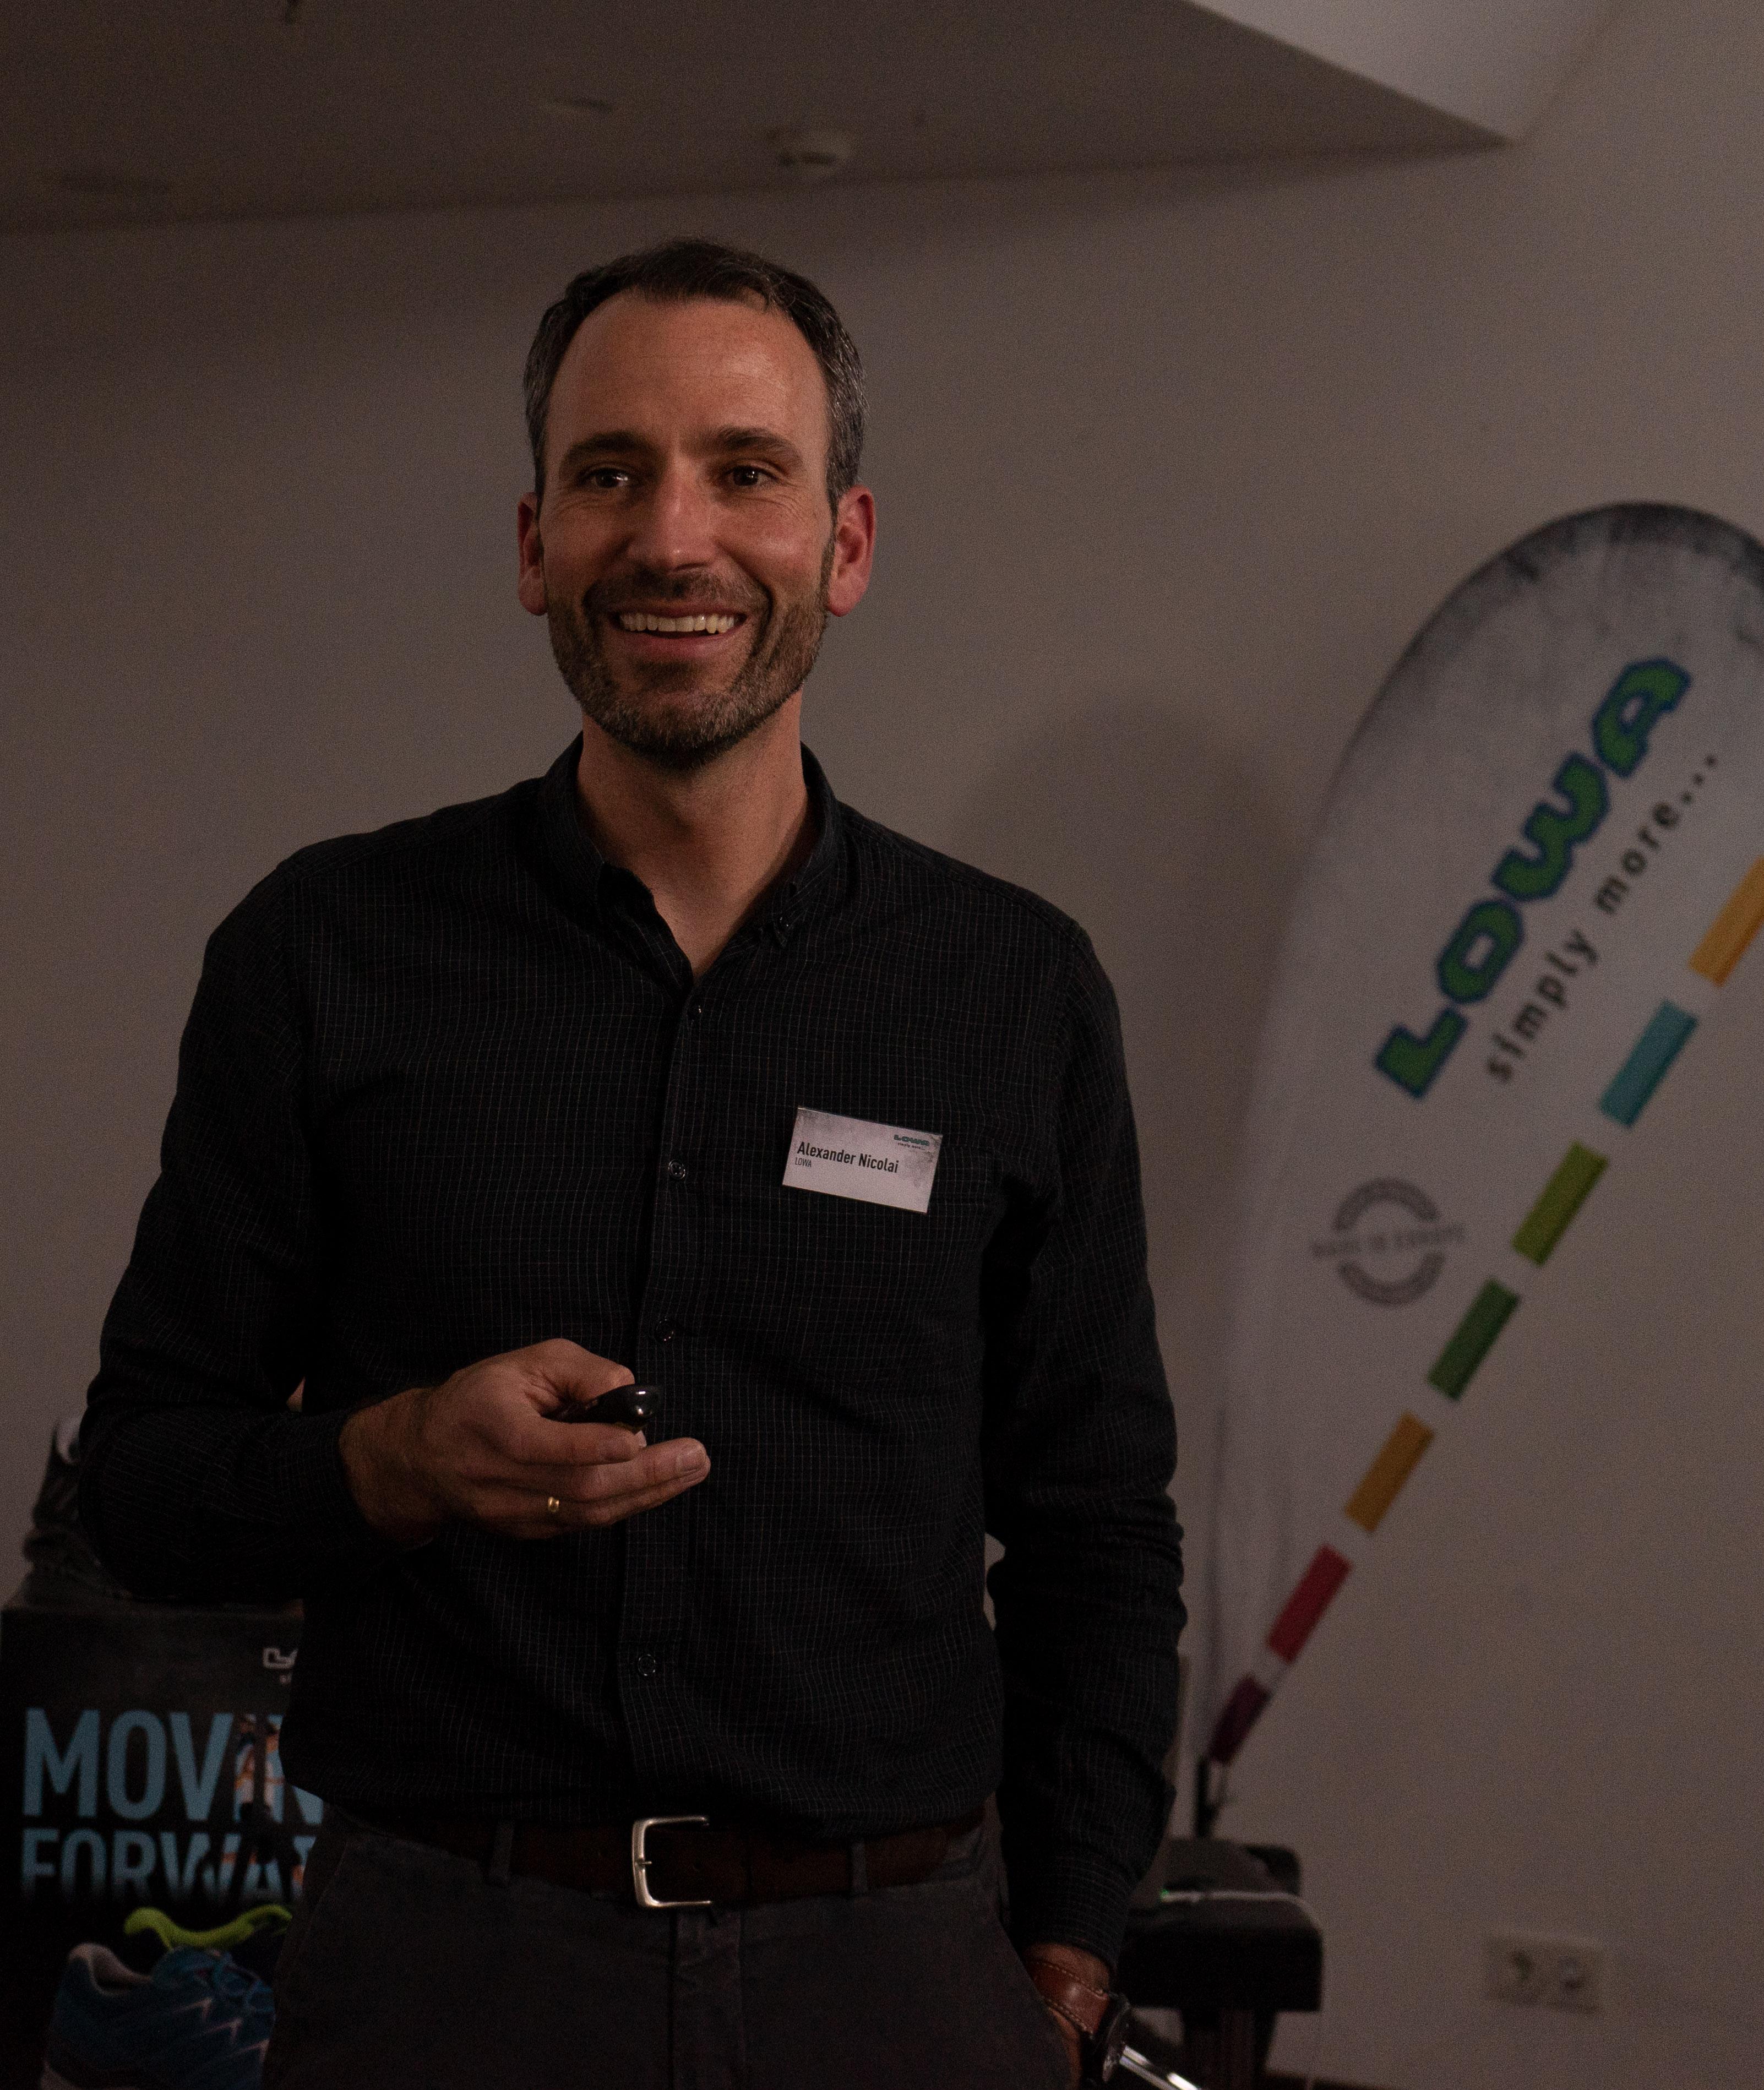 CEO Alexander Nicolai